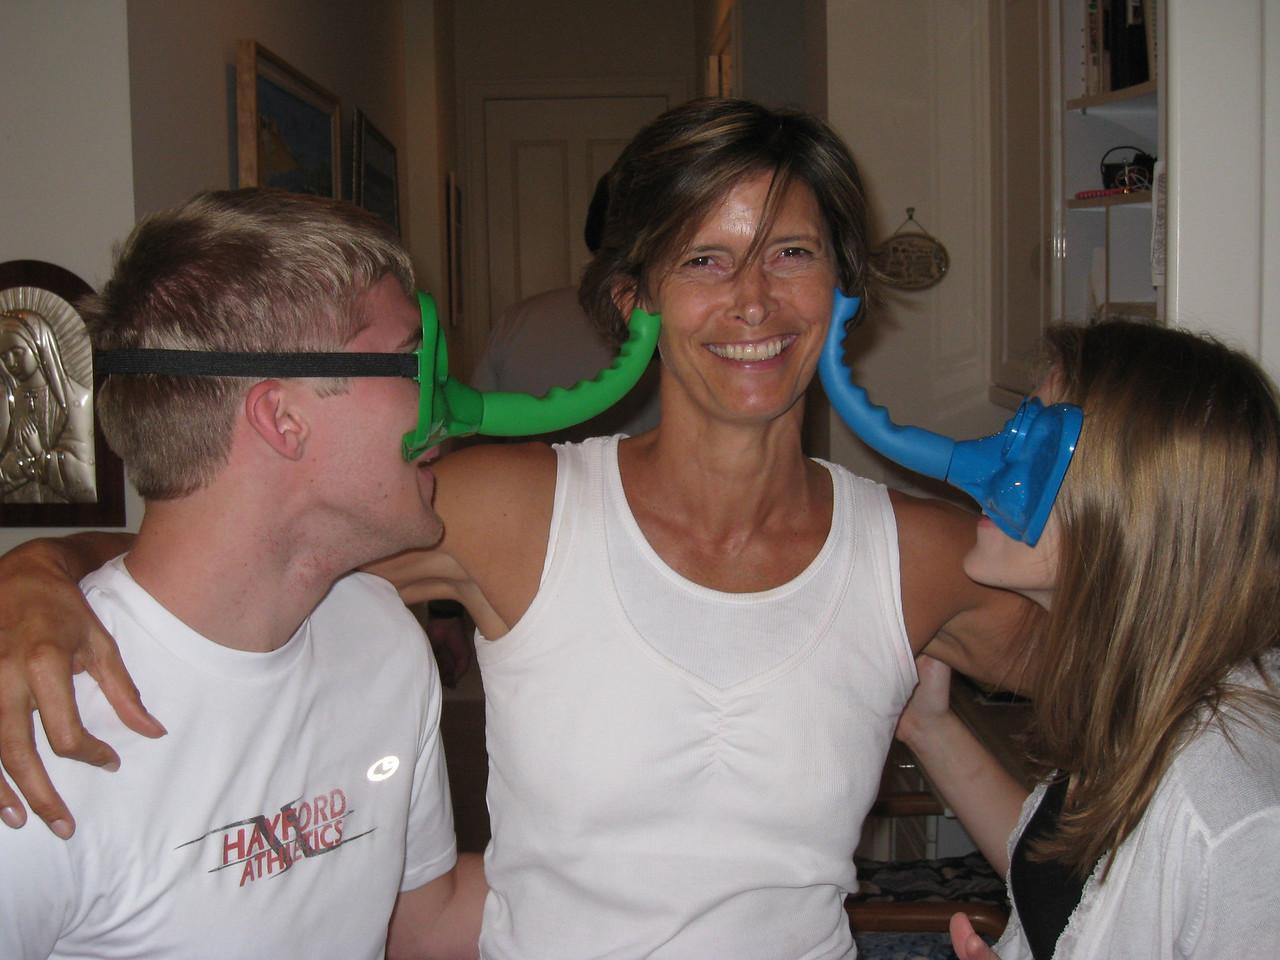 Hayford earwax cleaning ritual.